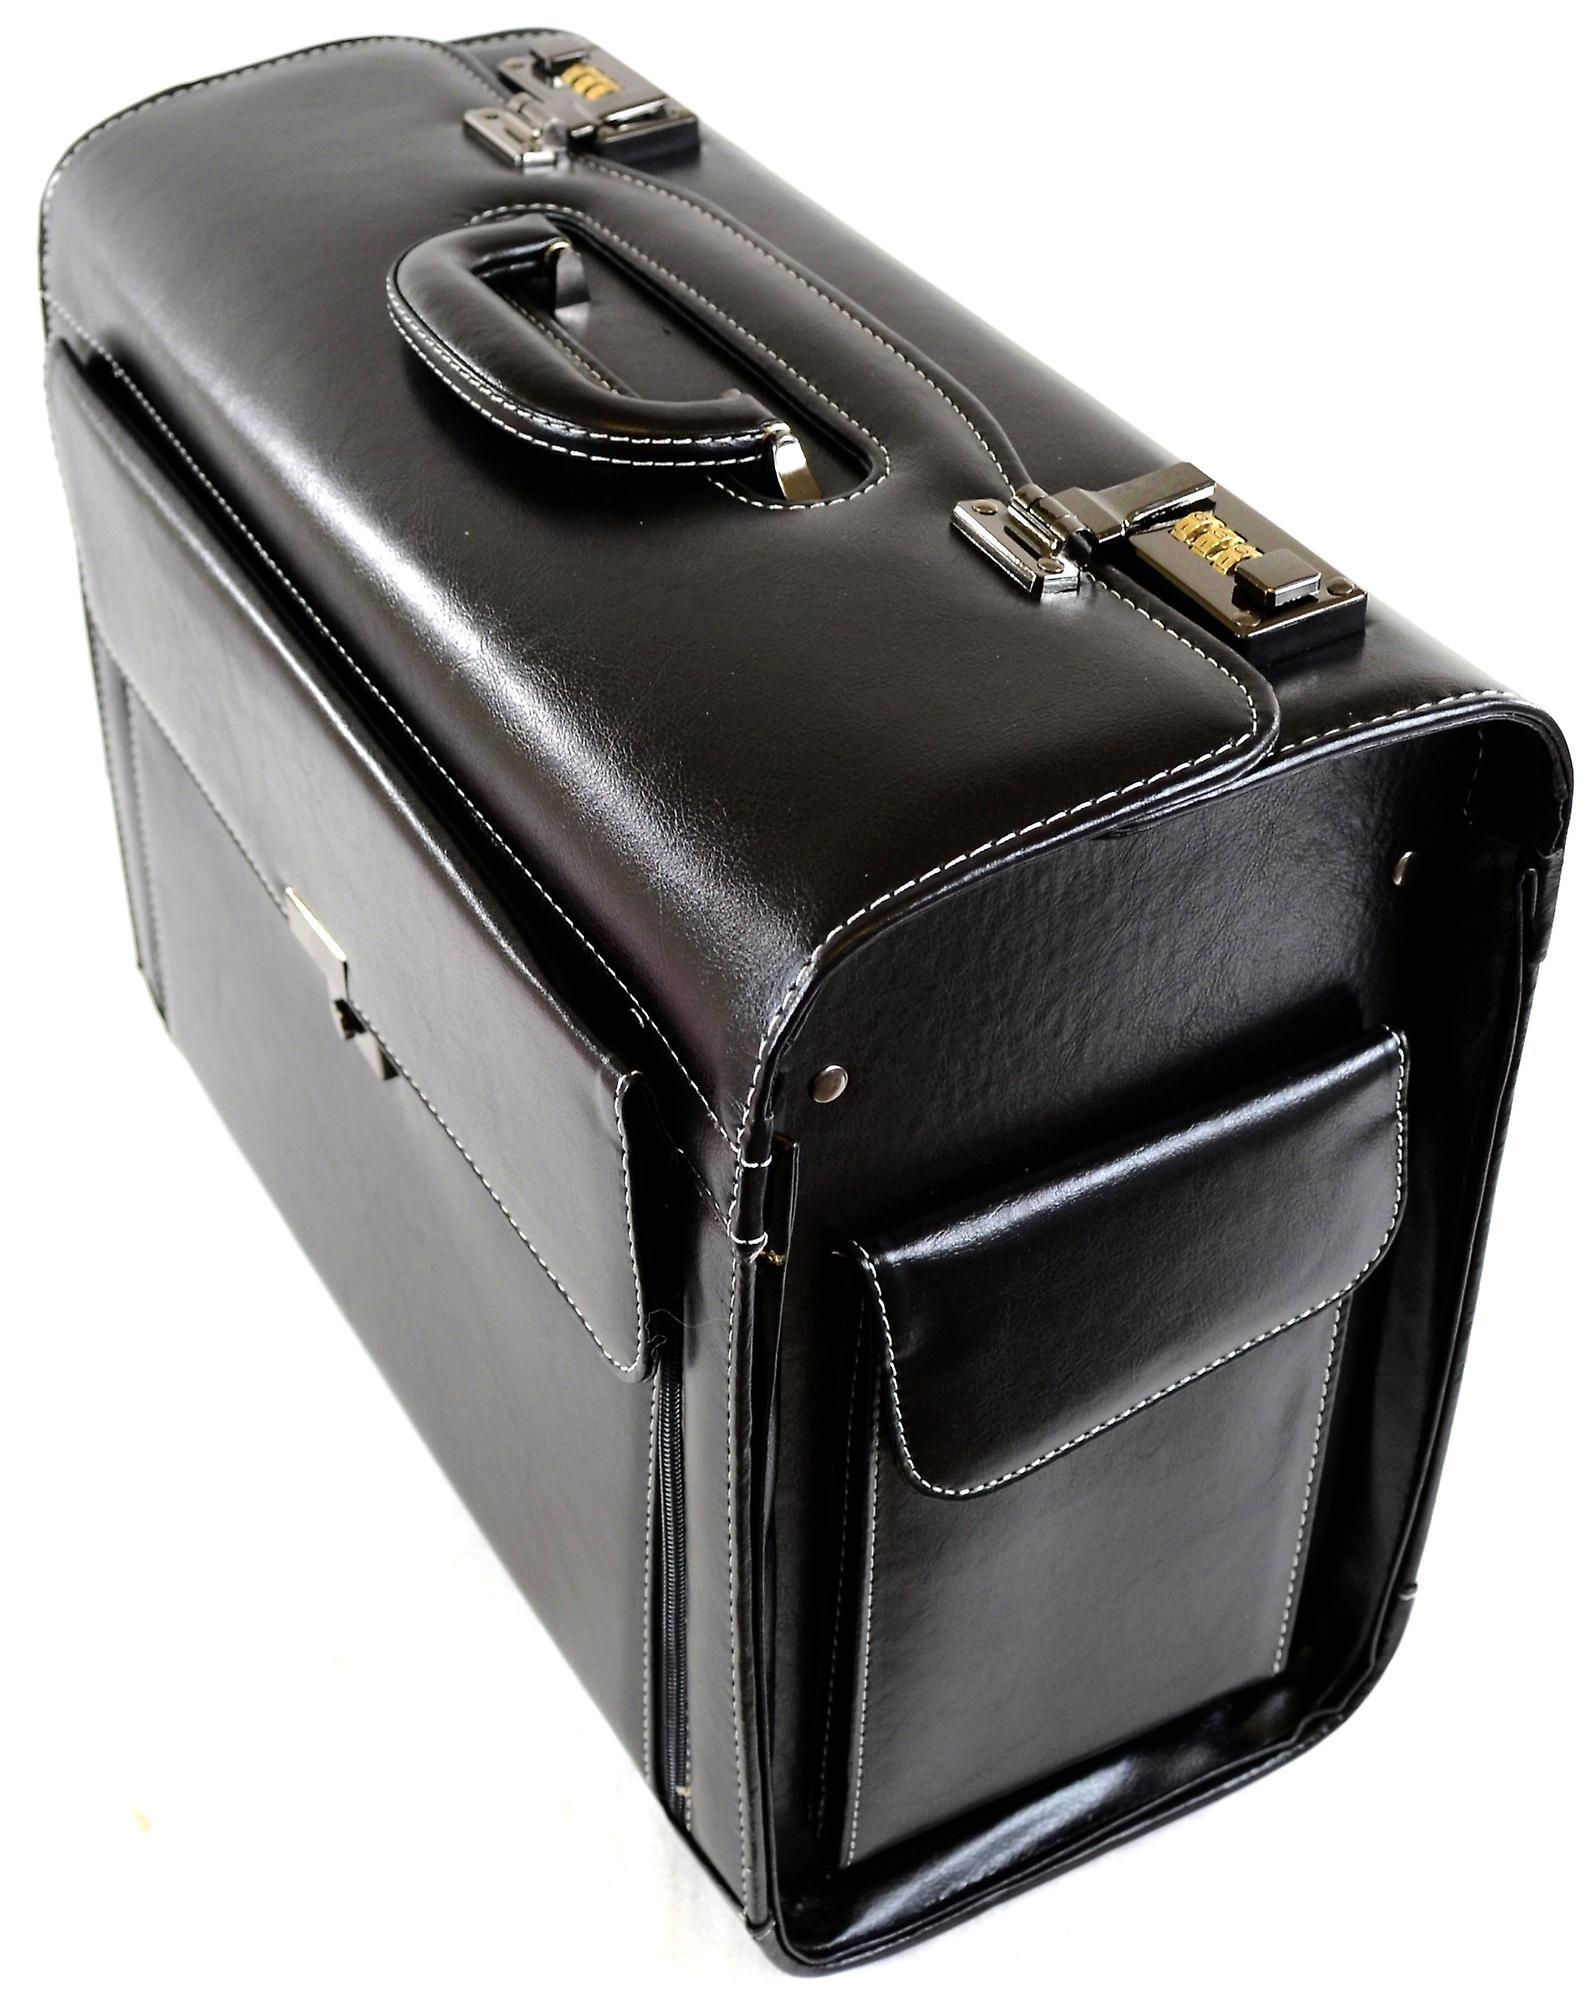 Mens / Womens Black Executive / Professional / Business Pilot Case / Carry / Travel Case